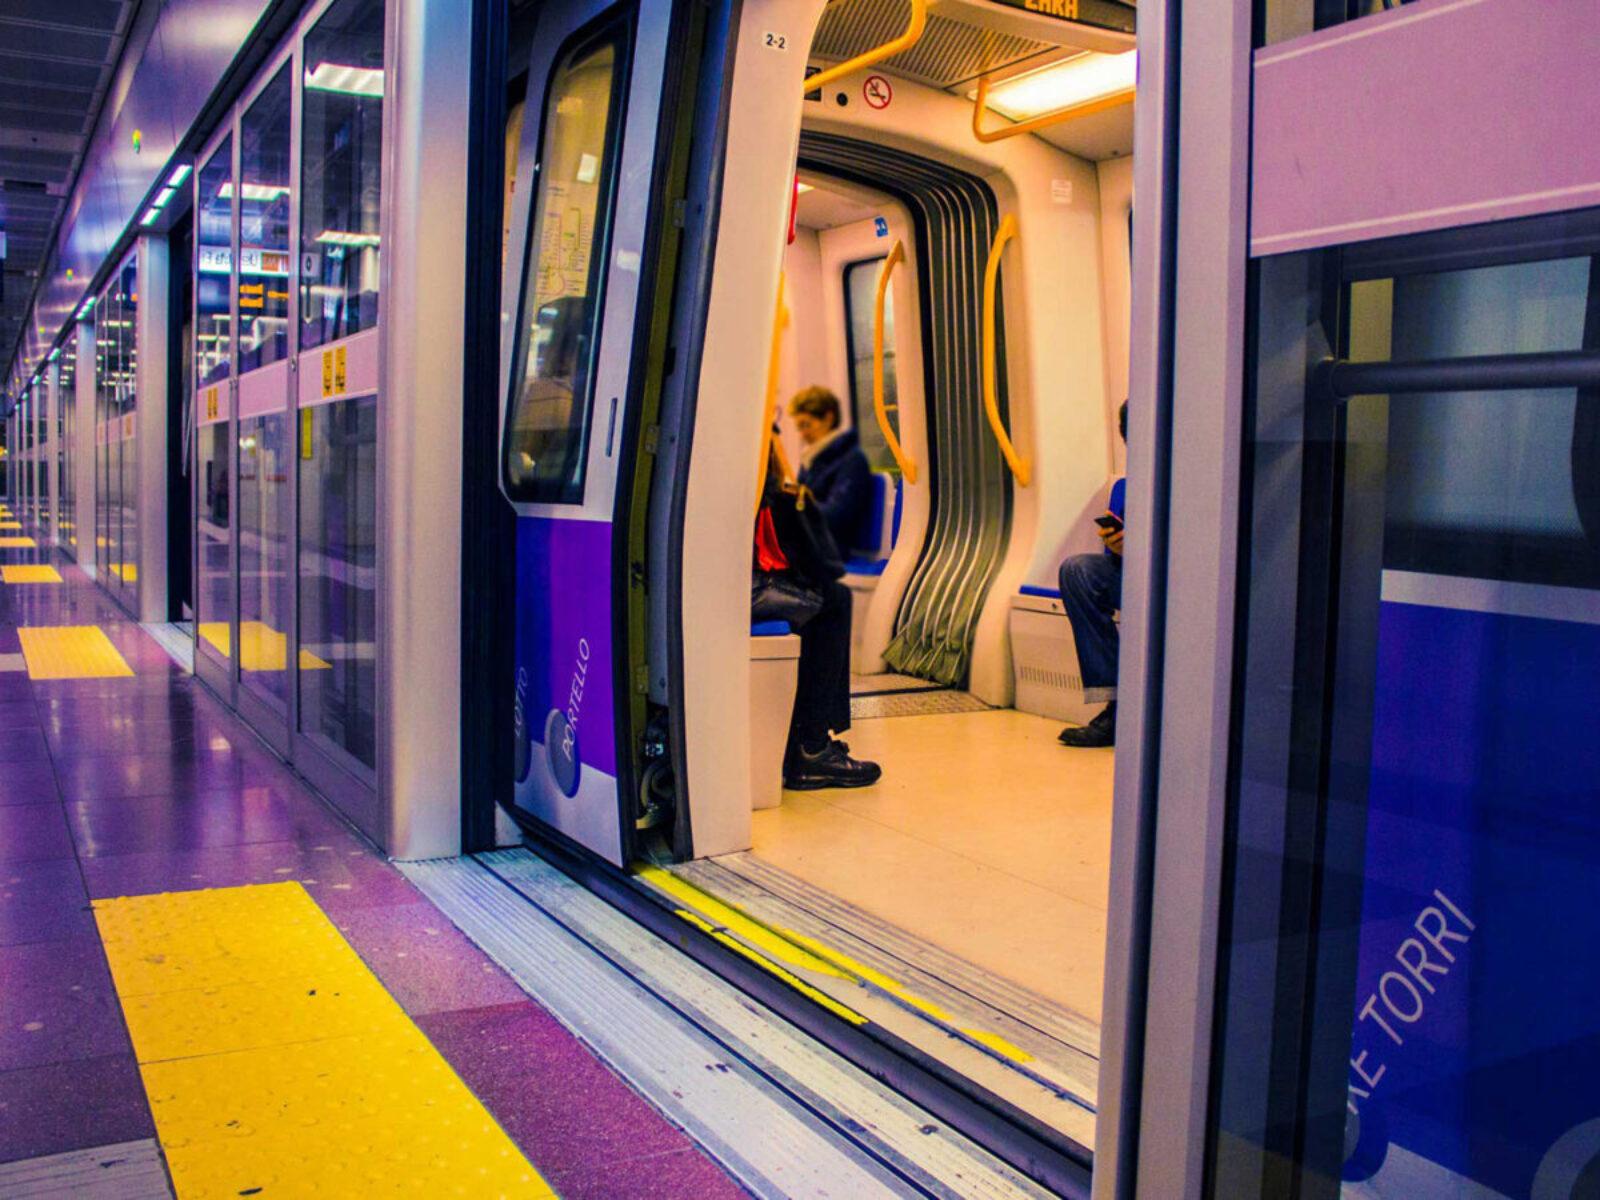 CityLife – Infrastructures and Primary Urbanization Works